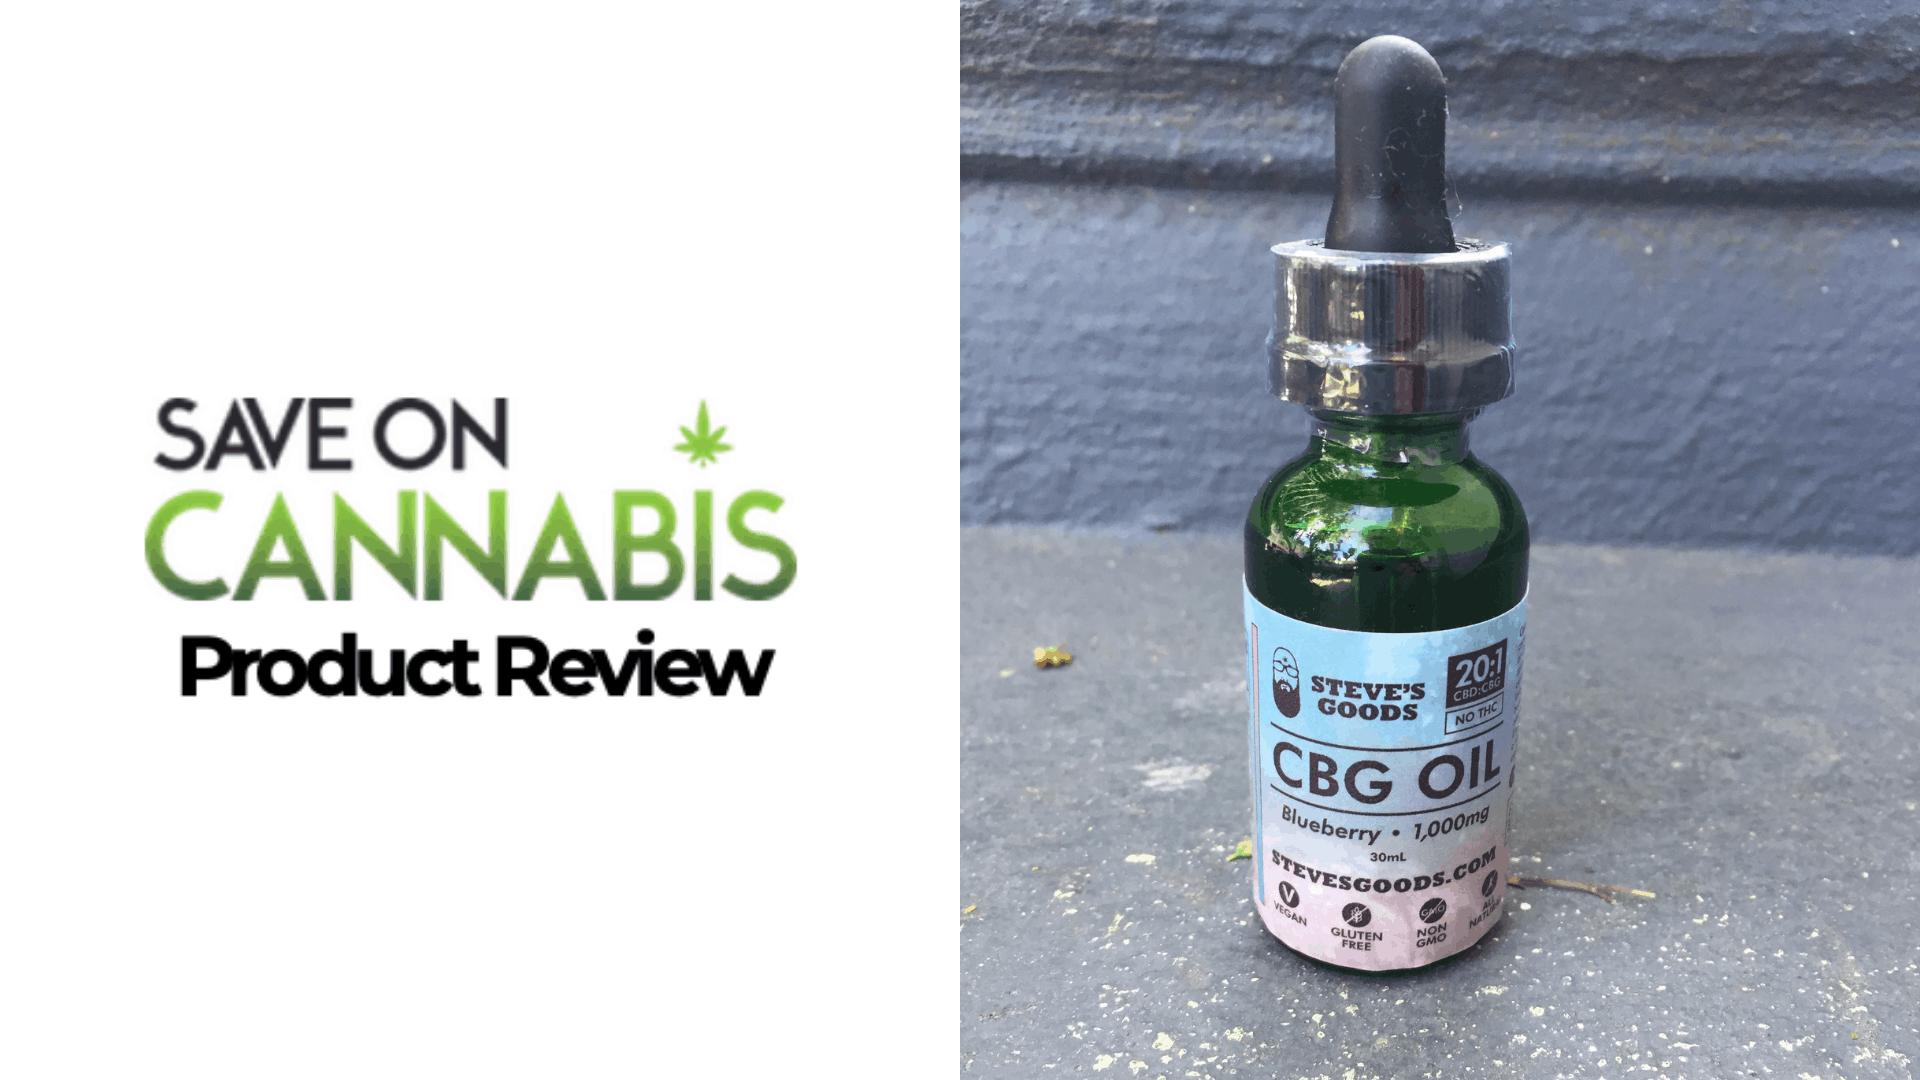 Steve's Goods CBD Review - CBD / CBG Oil 100mg - Save On Cannabis